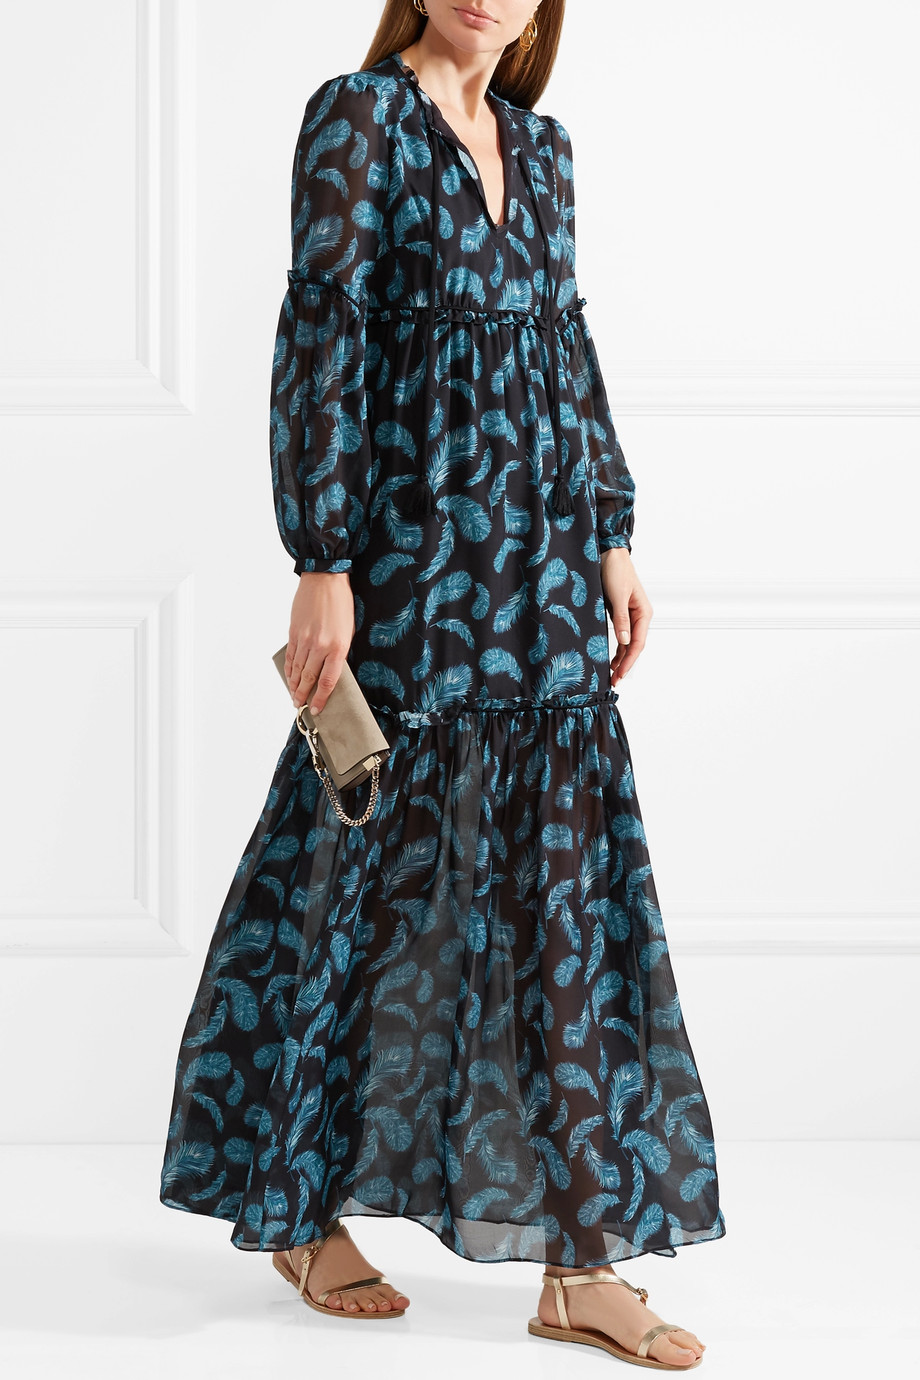 racheael zoe fall 2018 print dress